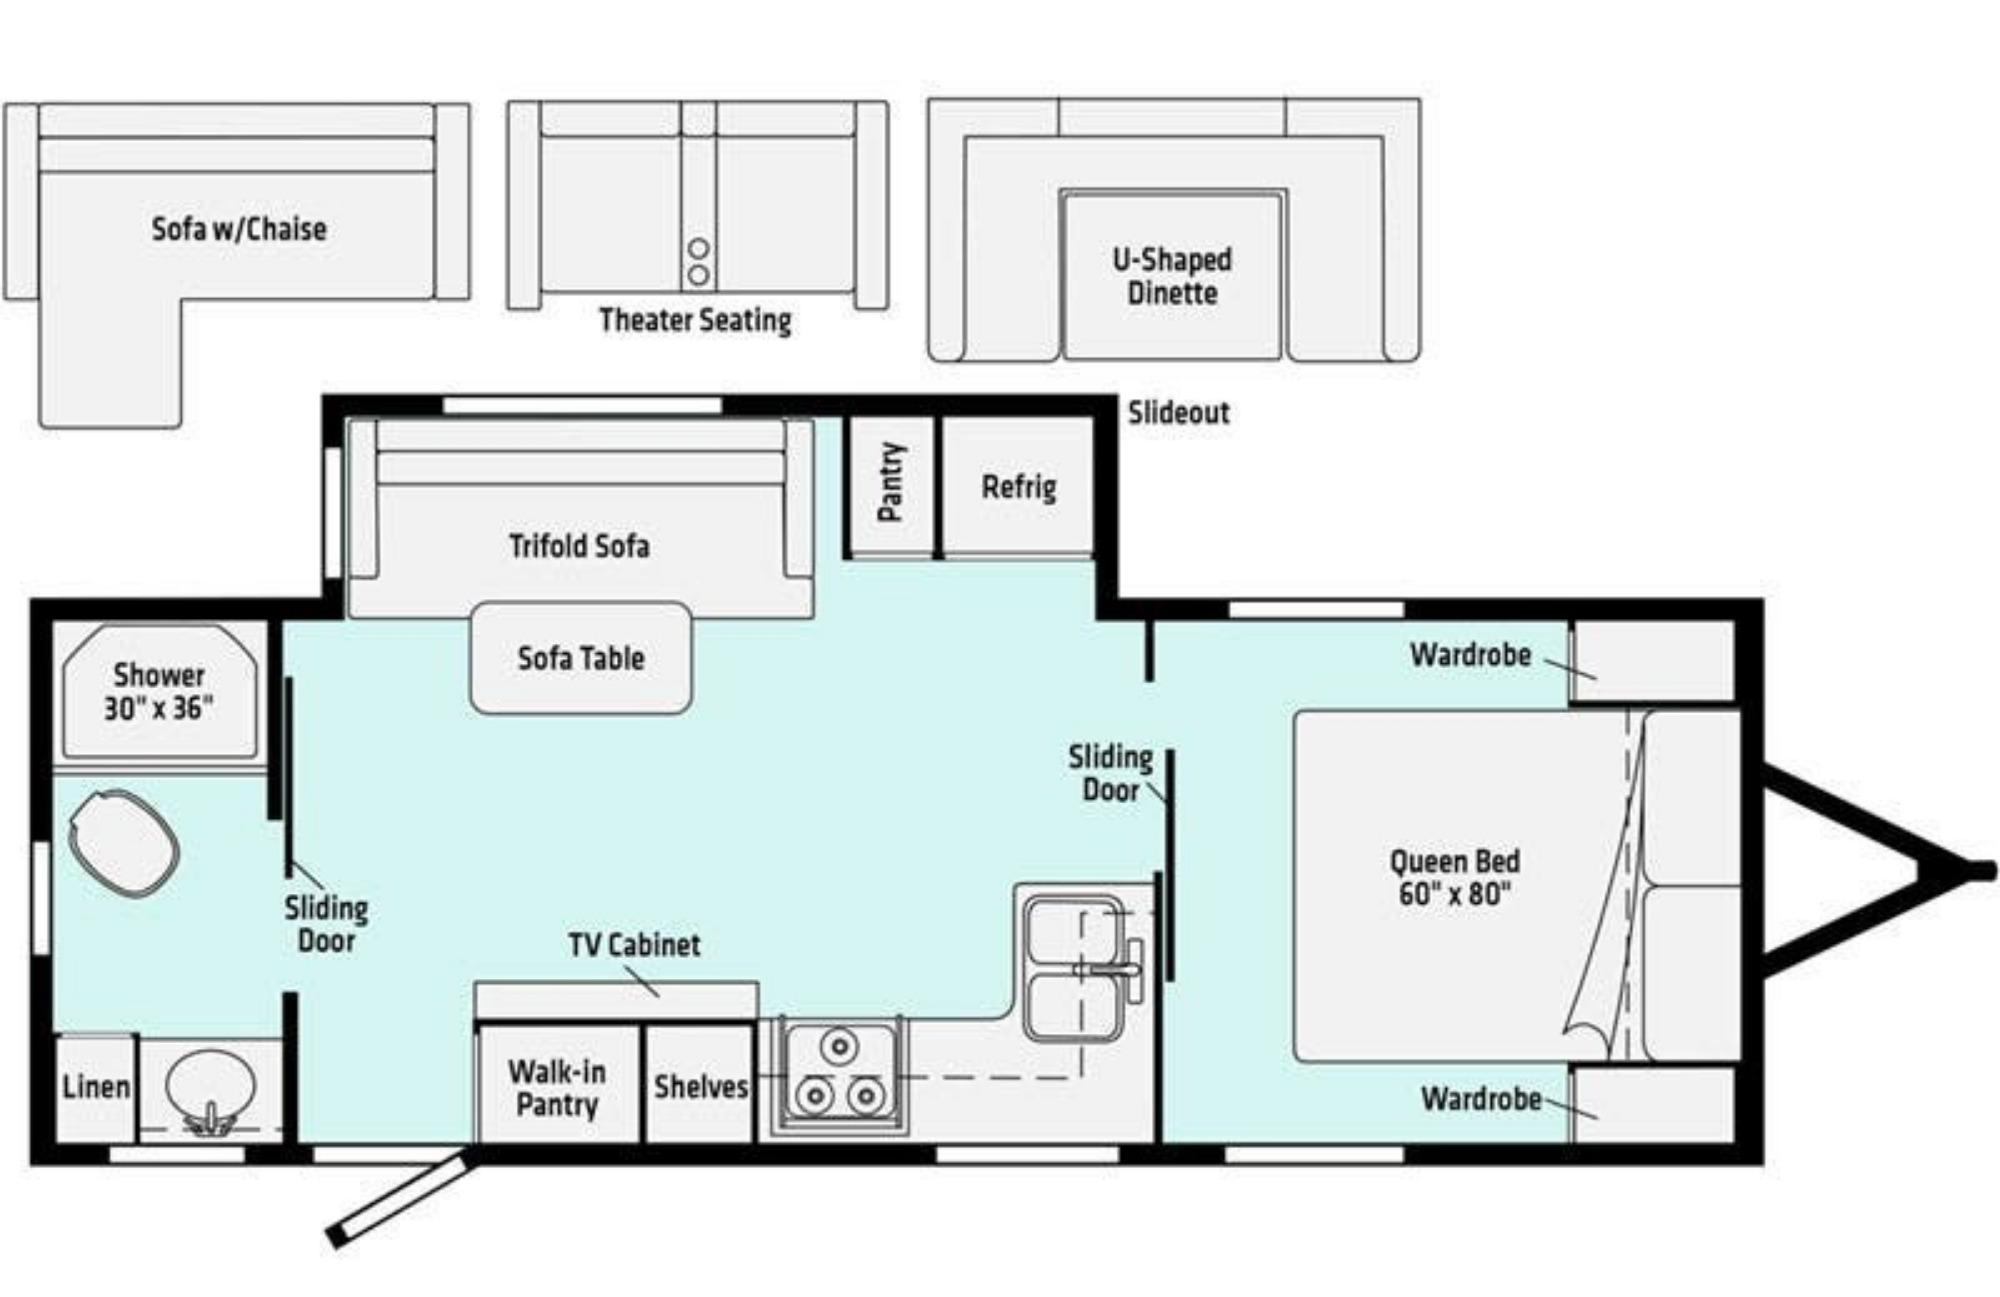 View Floor Plan for 2021 WINNEBAGO MINNIE 2202RBS